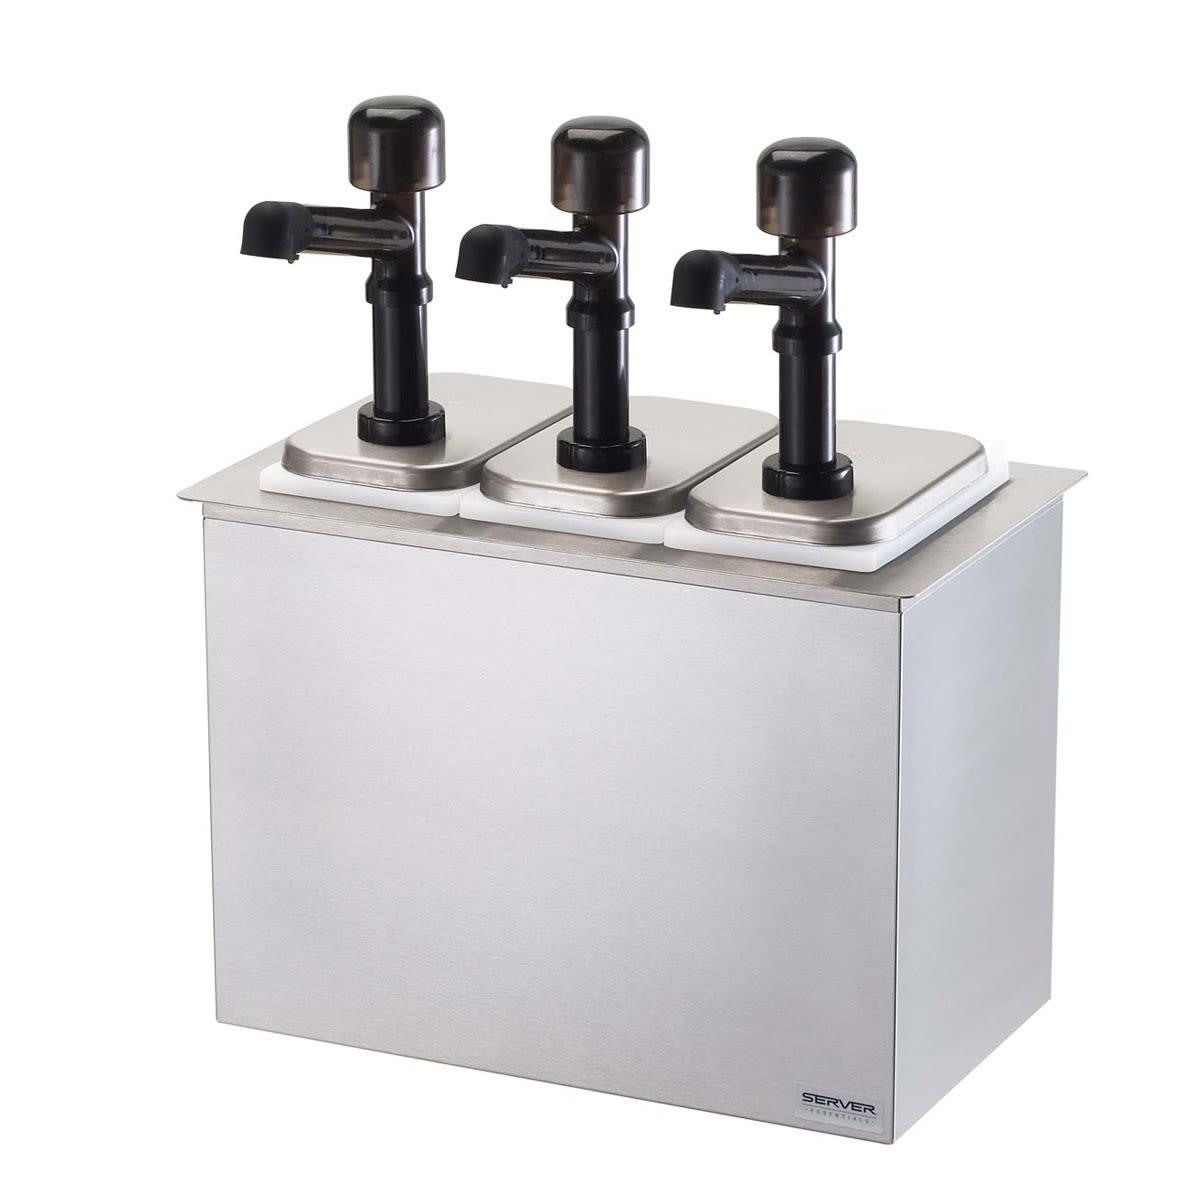 Server 79820 Pump Style Condiment Dispenser w/ (3) 1-oz/Stroke, Stainless